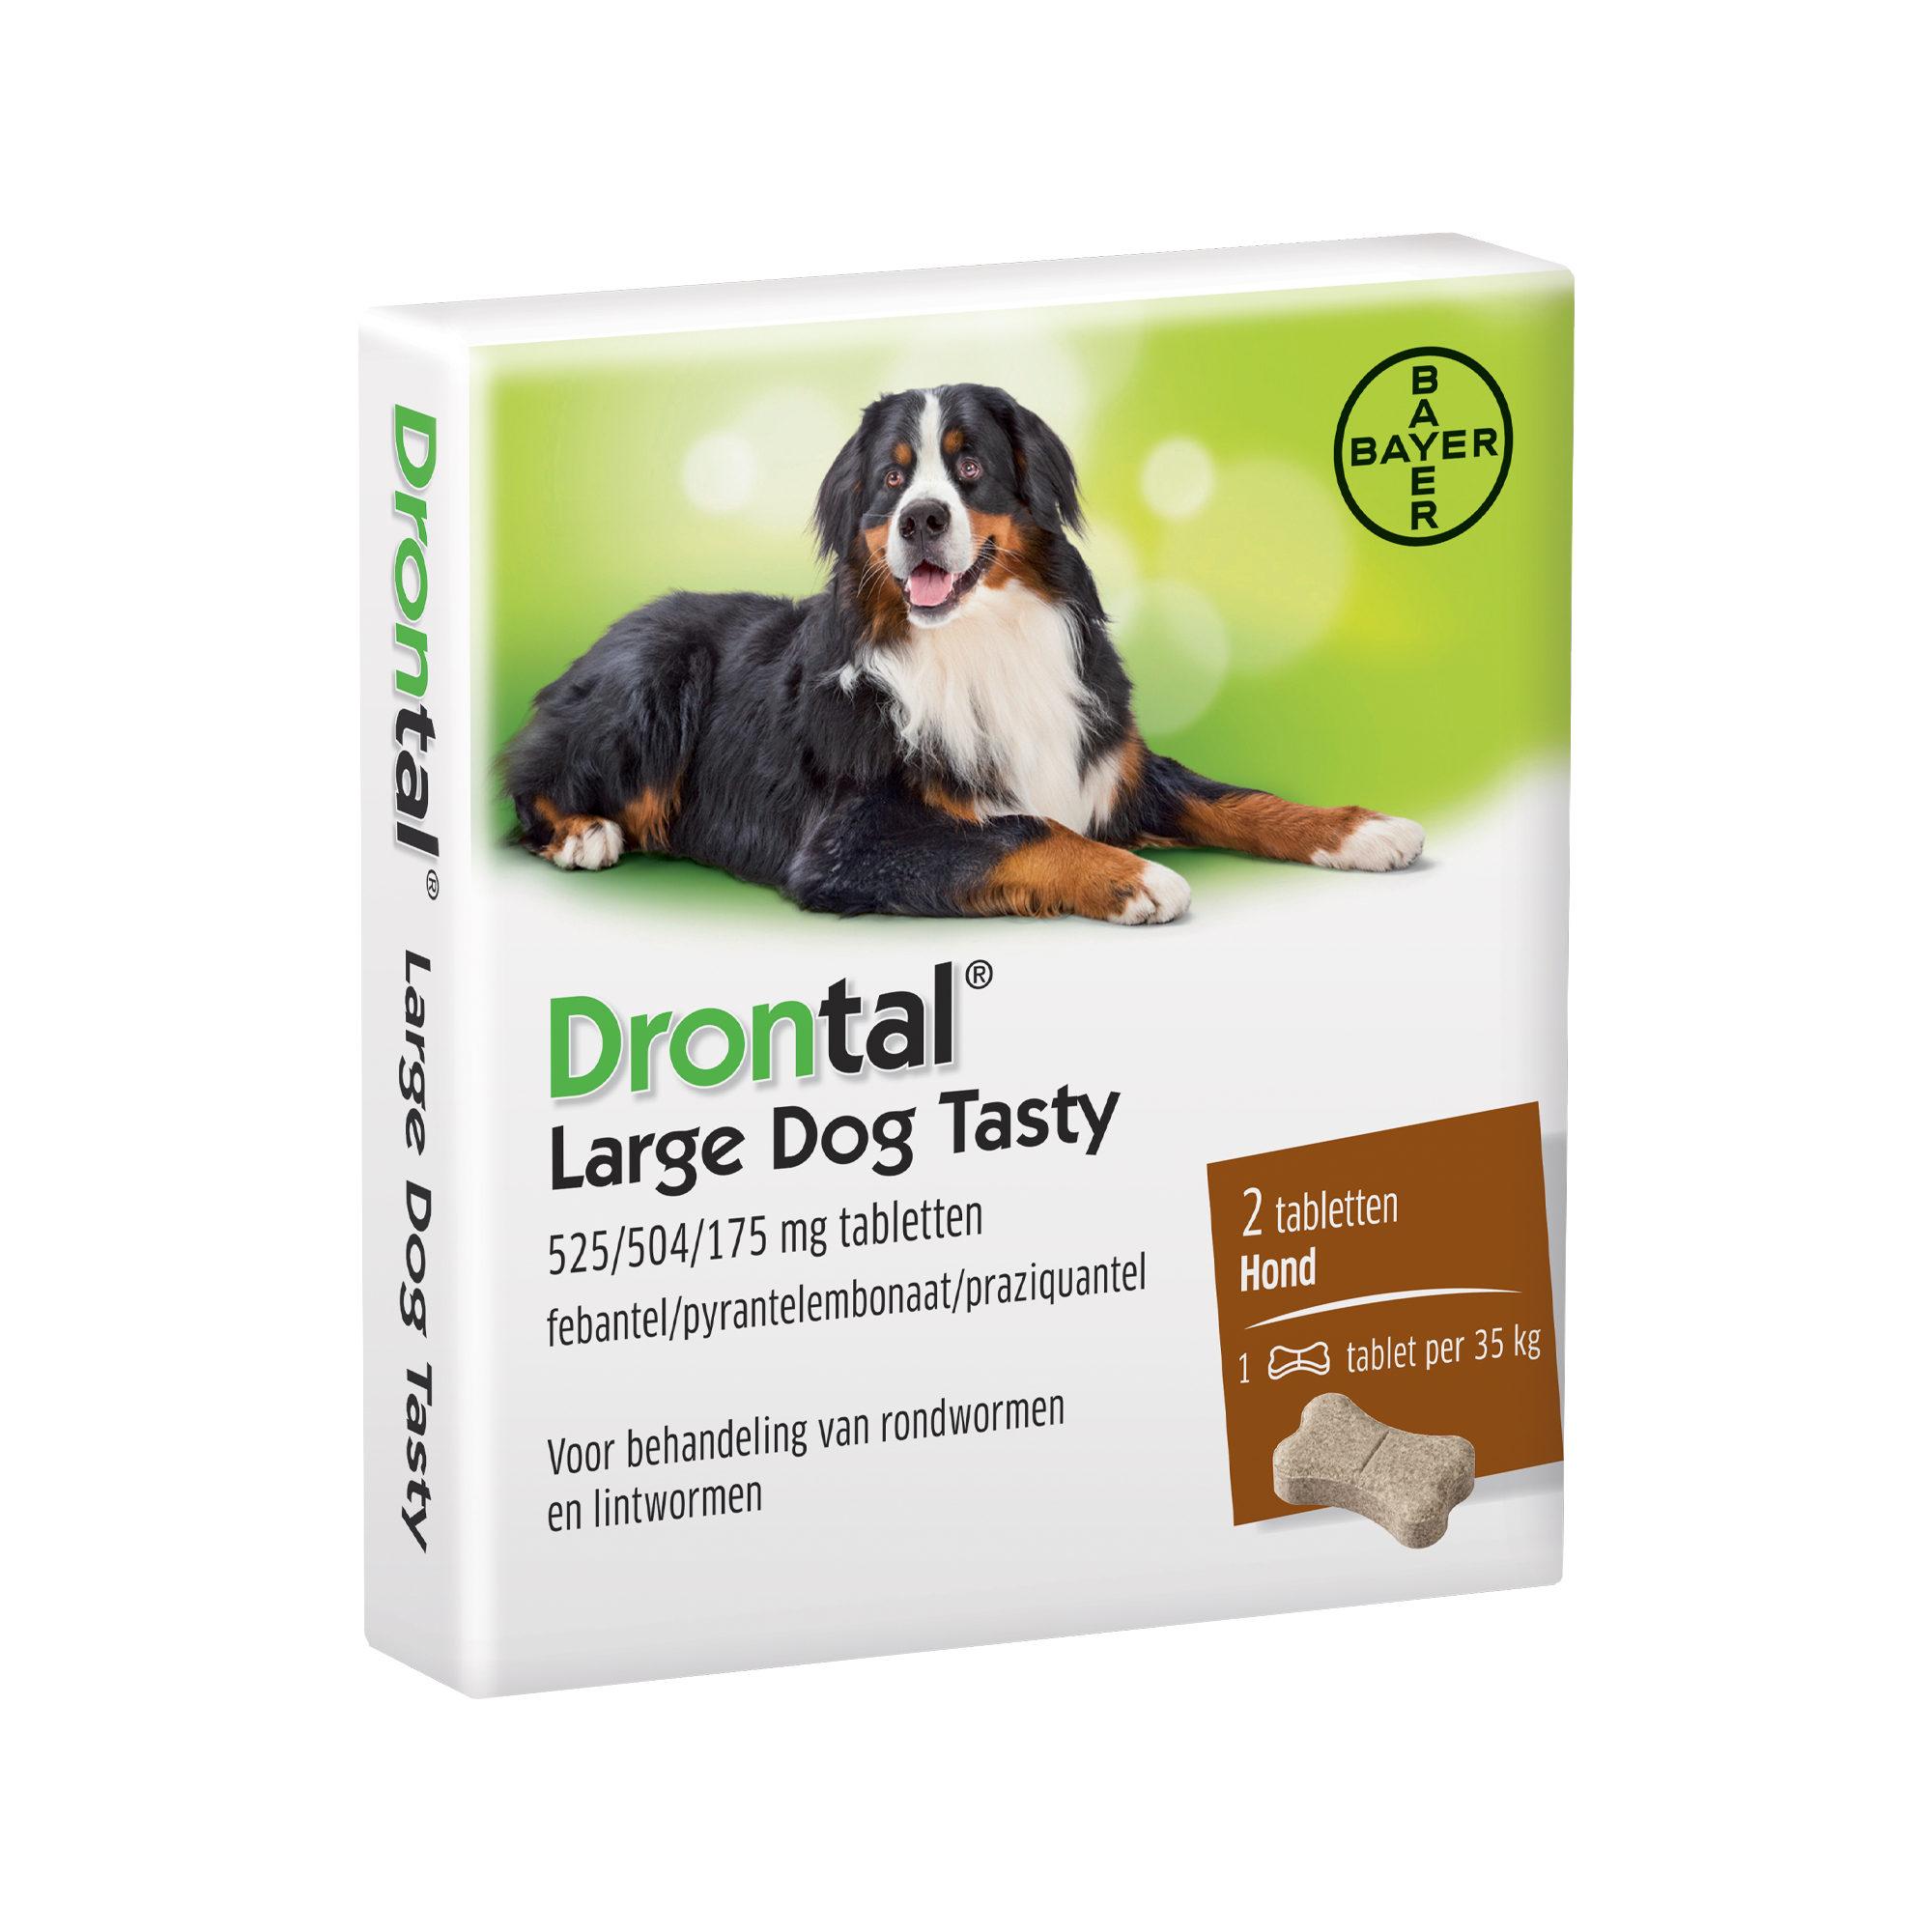 Drontal Large Dog Tasty